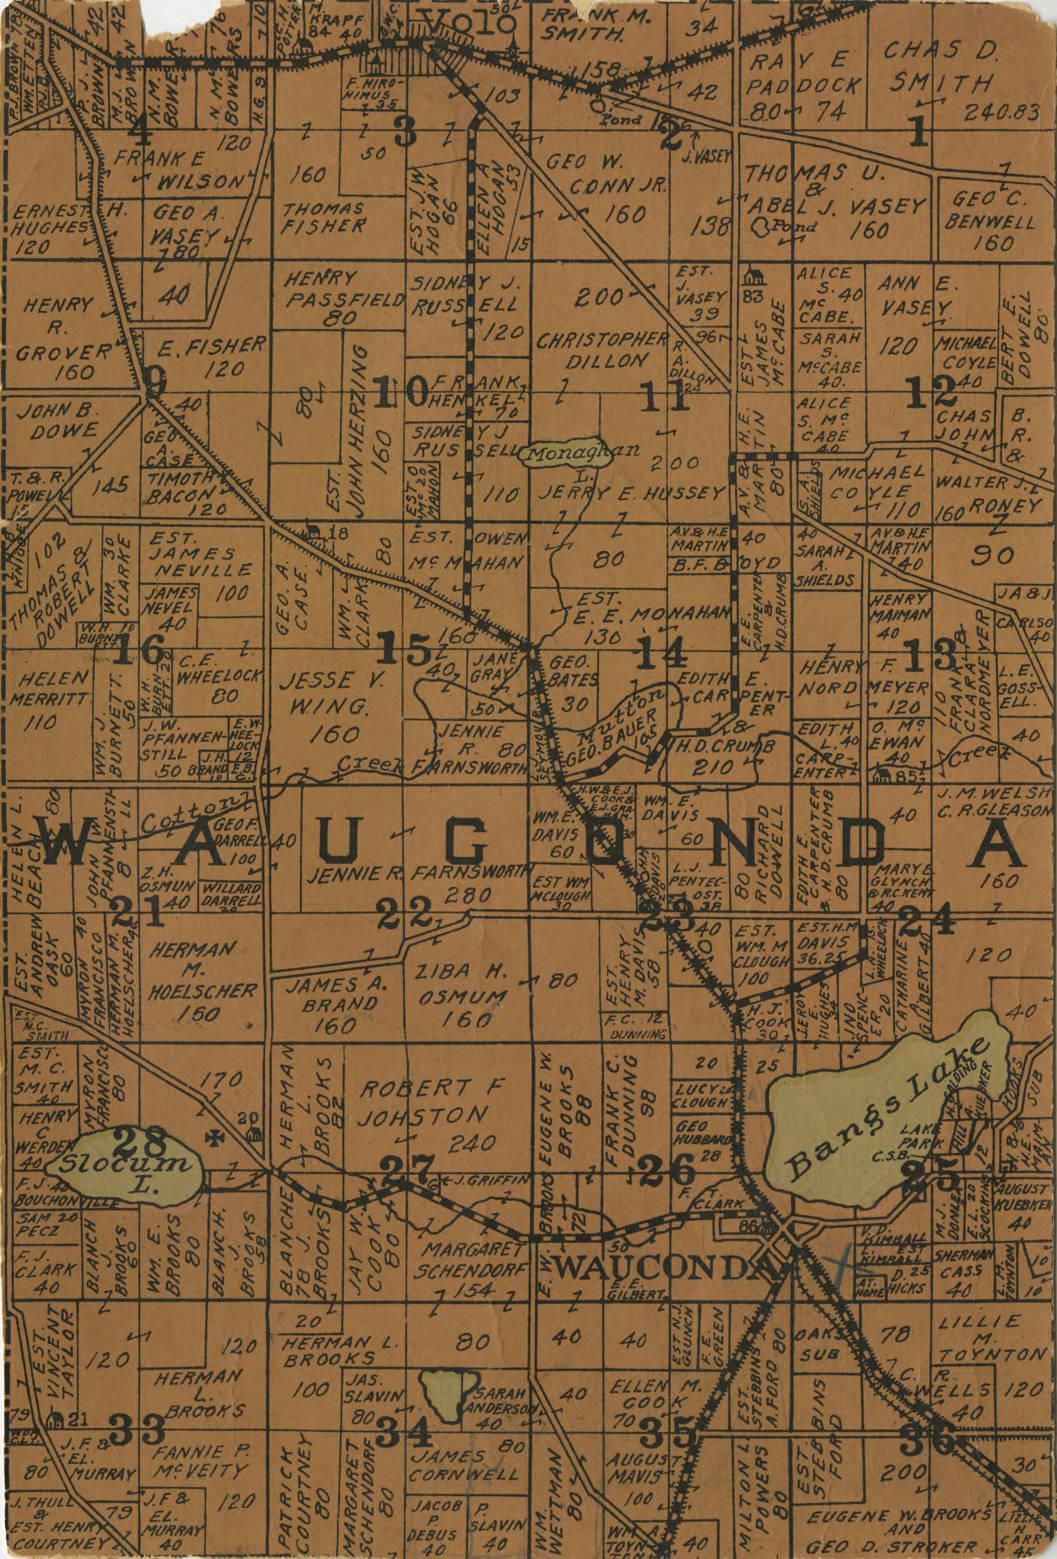 C:\Users\Vern\Documents\Fort Hill\1918 Schools Centennial\1918 Wauconda Twp Glynch School\1918_School_Histories__Wauconda_Township__Glynch_School_2003045_Page_32.jpg